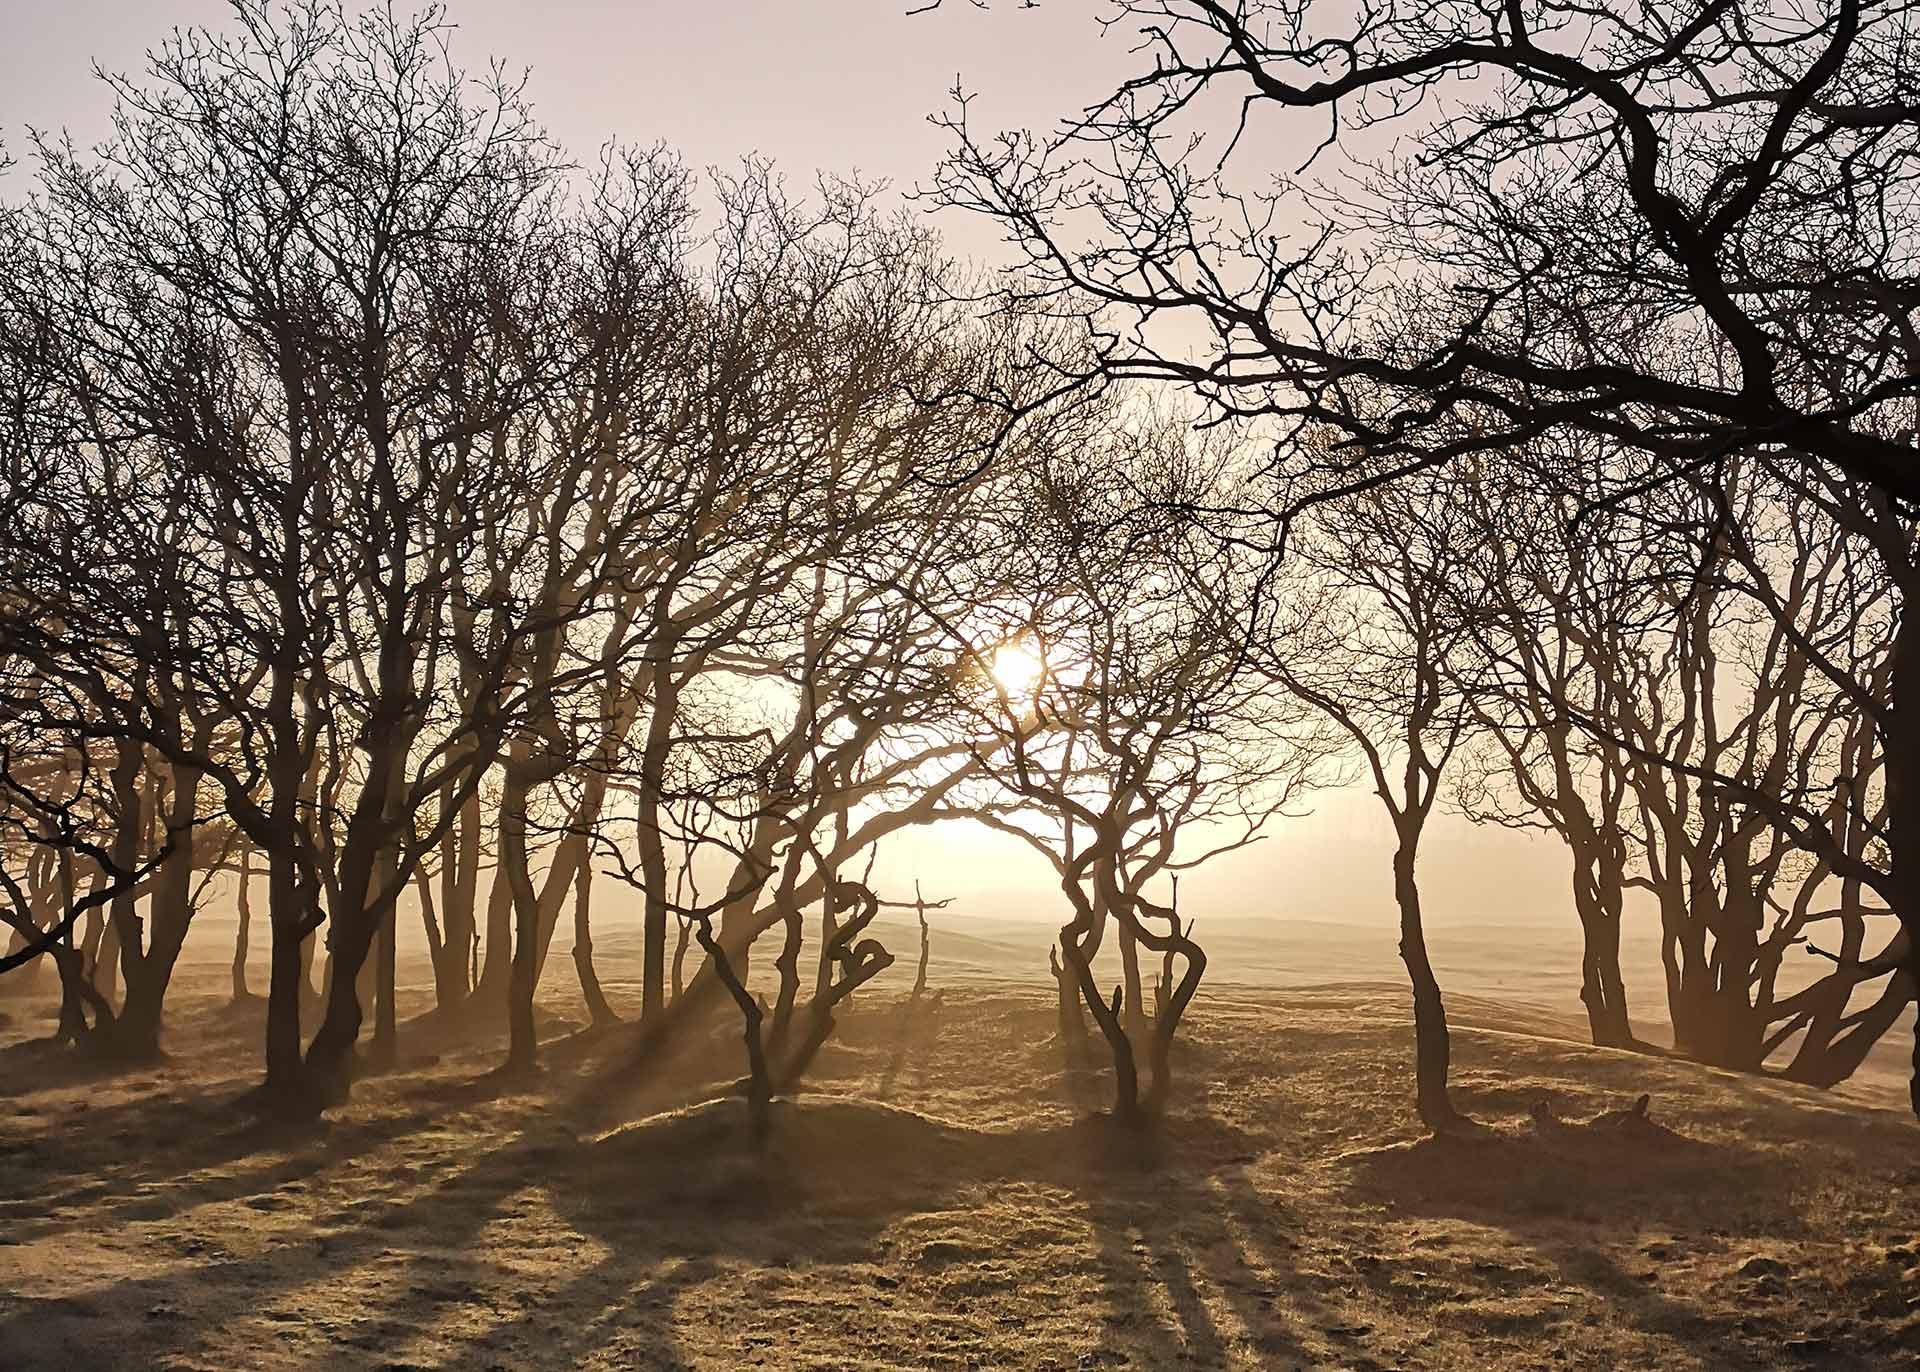 bomen fotograferen met tegenlicht zonsopkomst